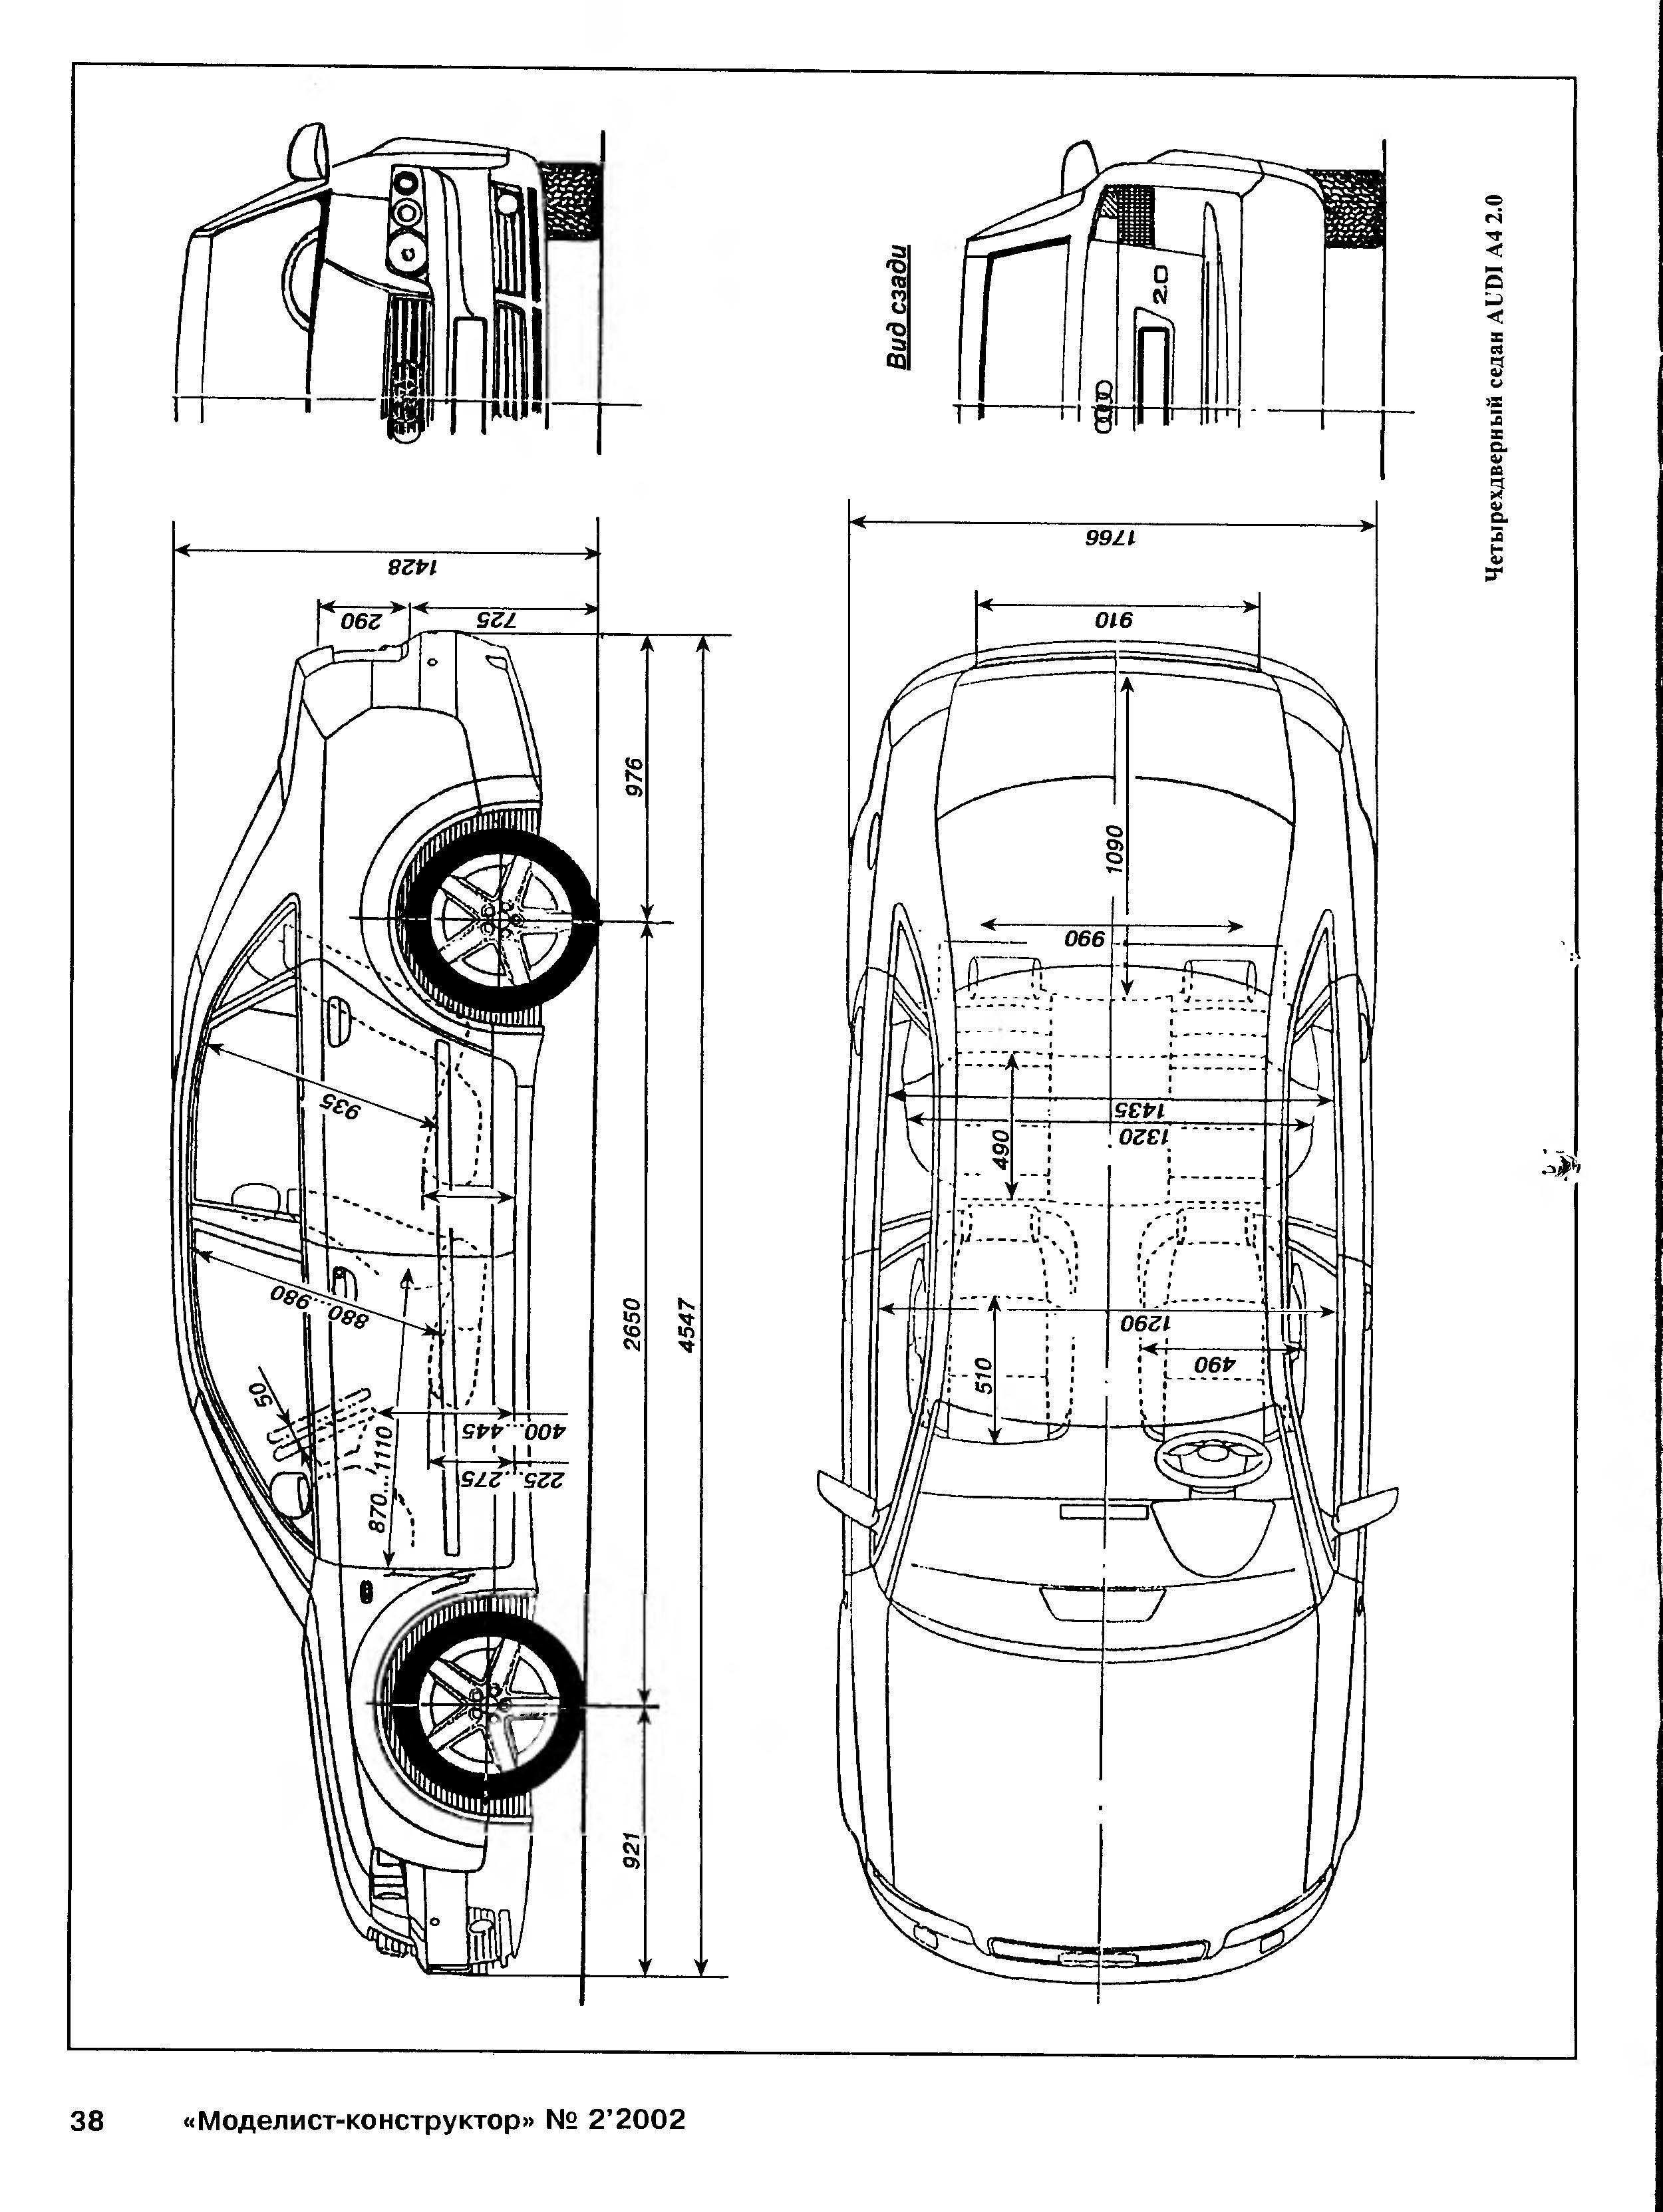 Four-door sedan AUDI A4 2.0